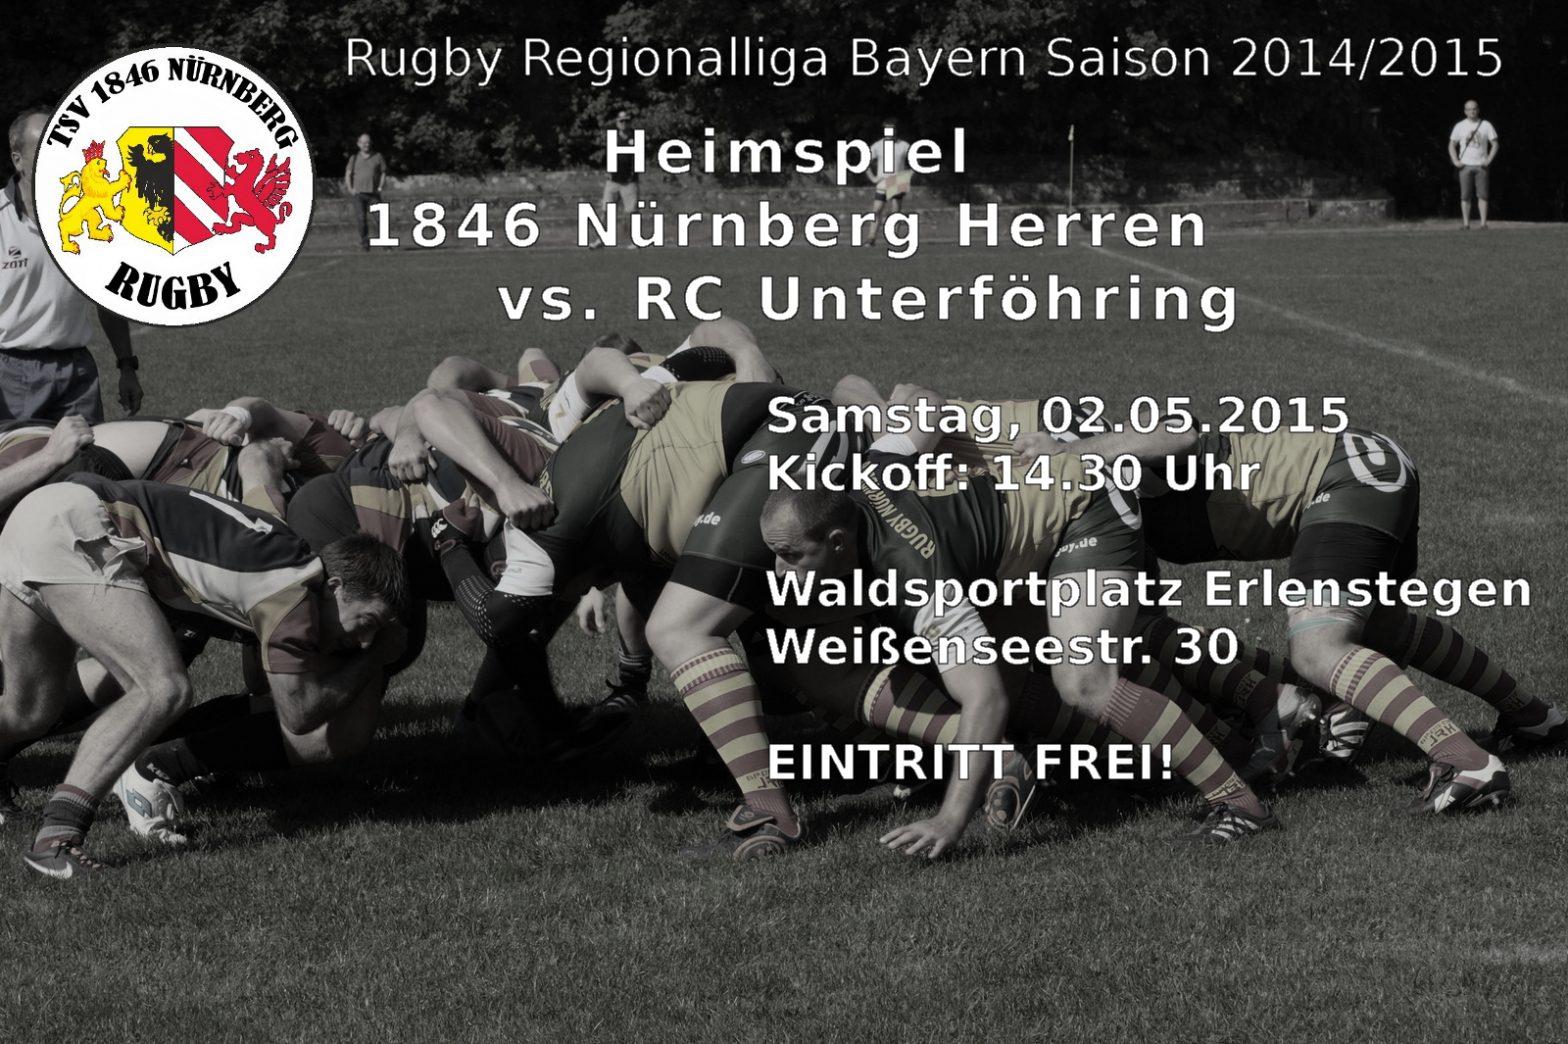 Rugby Regionalliga Bayern – TSV 1846 Nürnberg (Herren) vs. RC Unterföhring